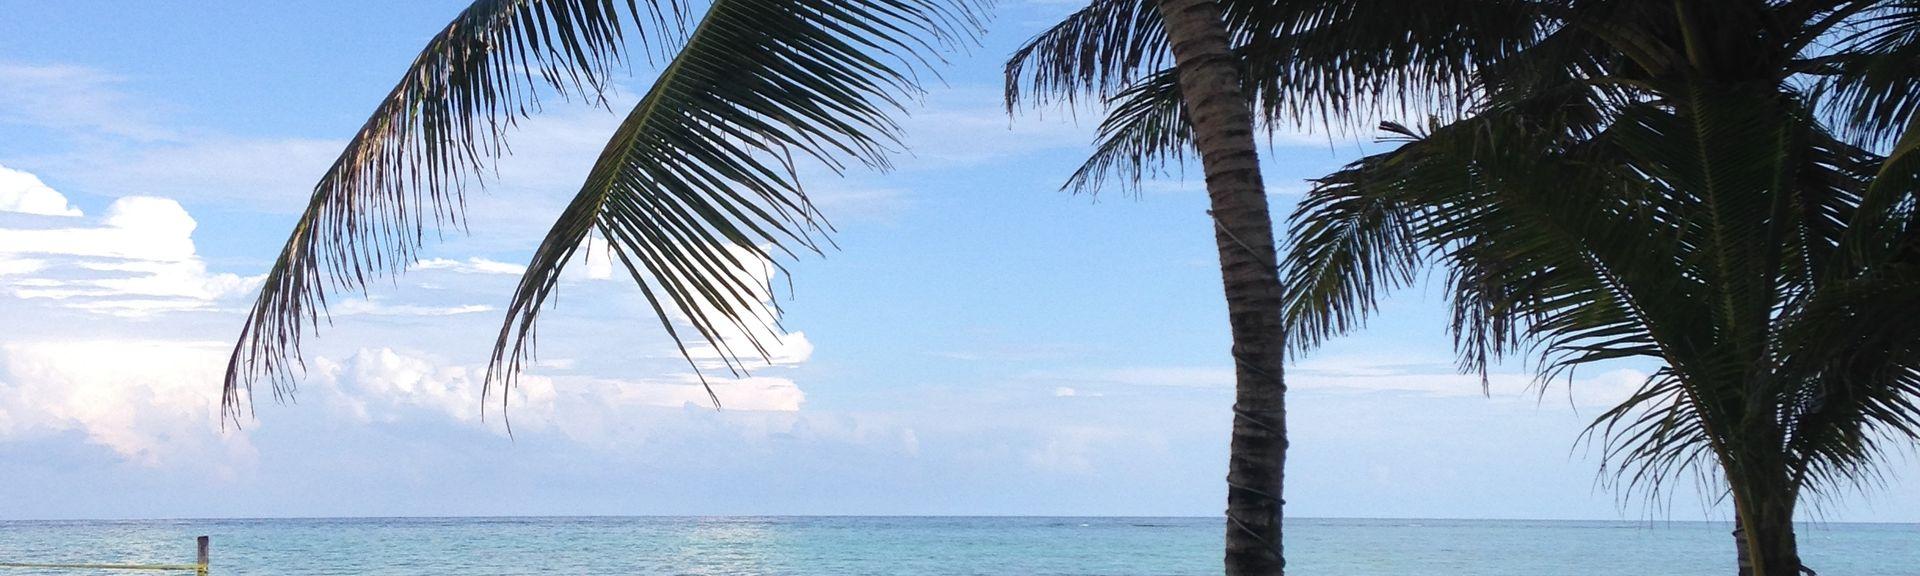 Tulum Municipality, Quintana Roo, Mexico